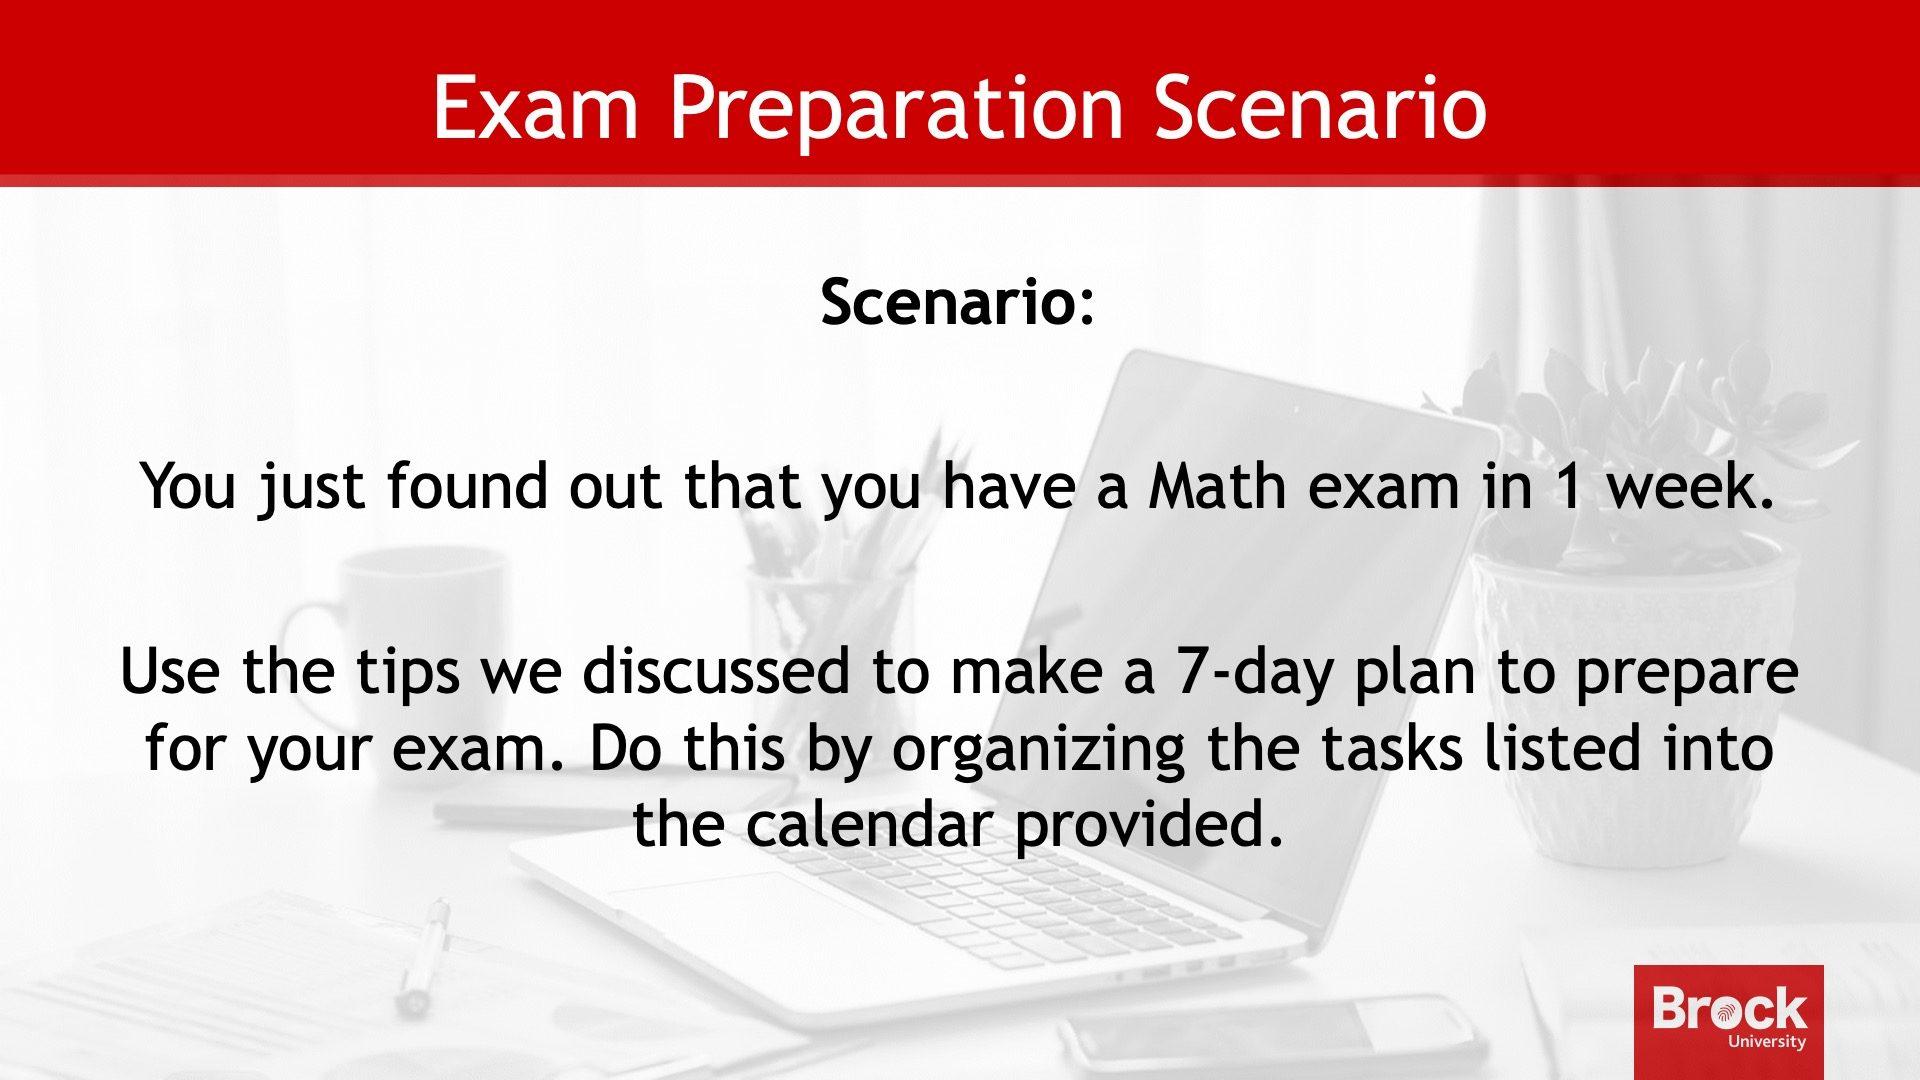 Exam preparation scenario